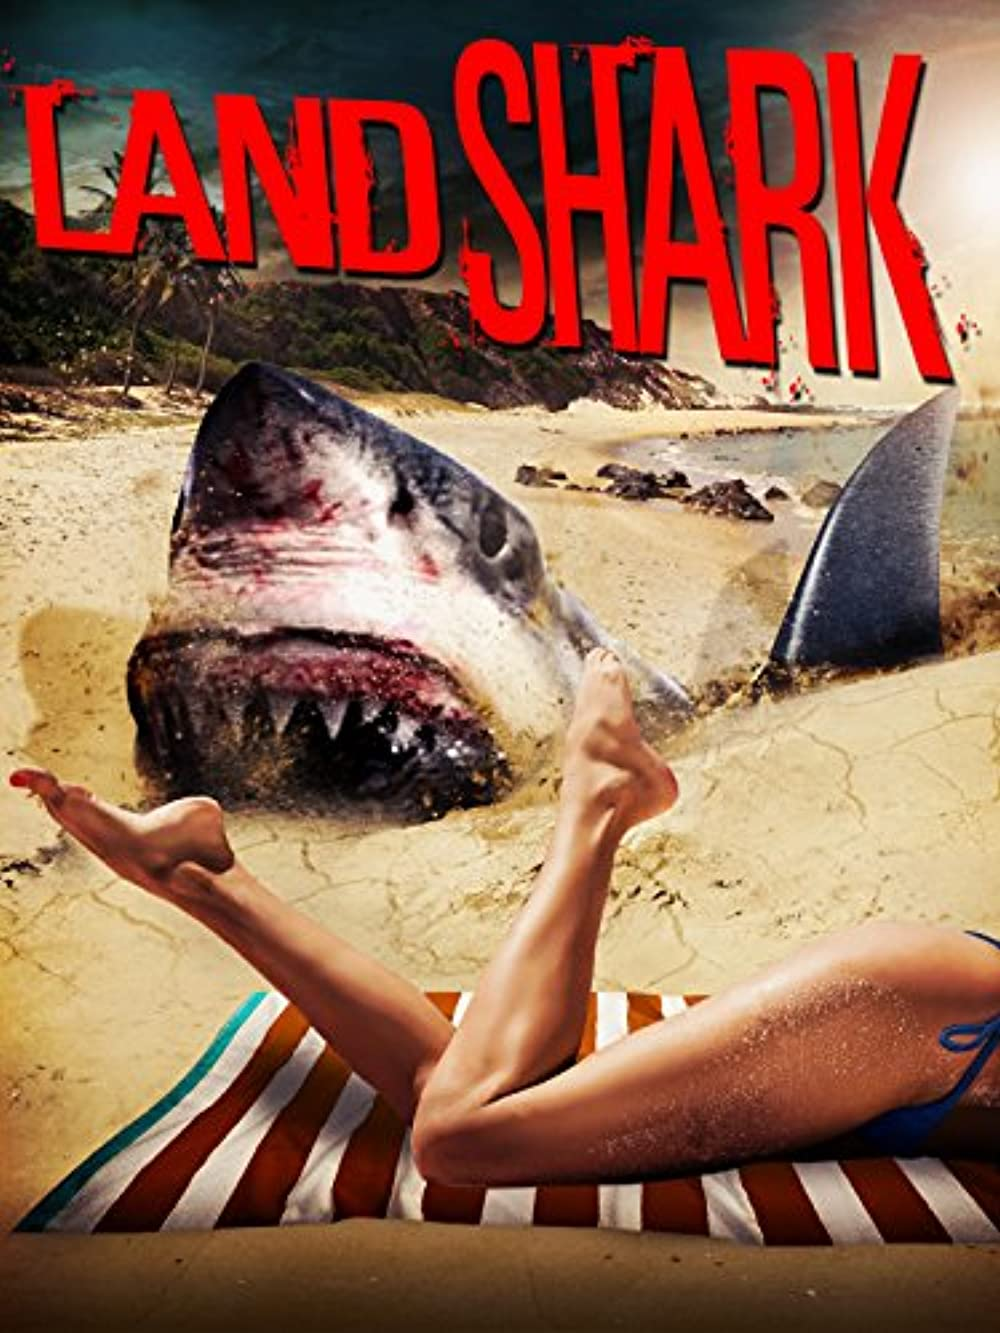 Movie the Podcast : Land Shark